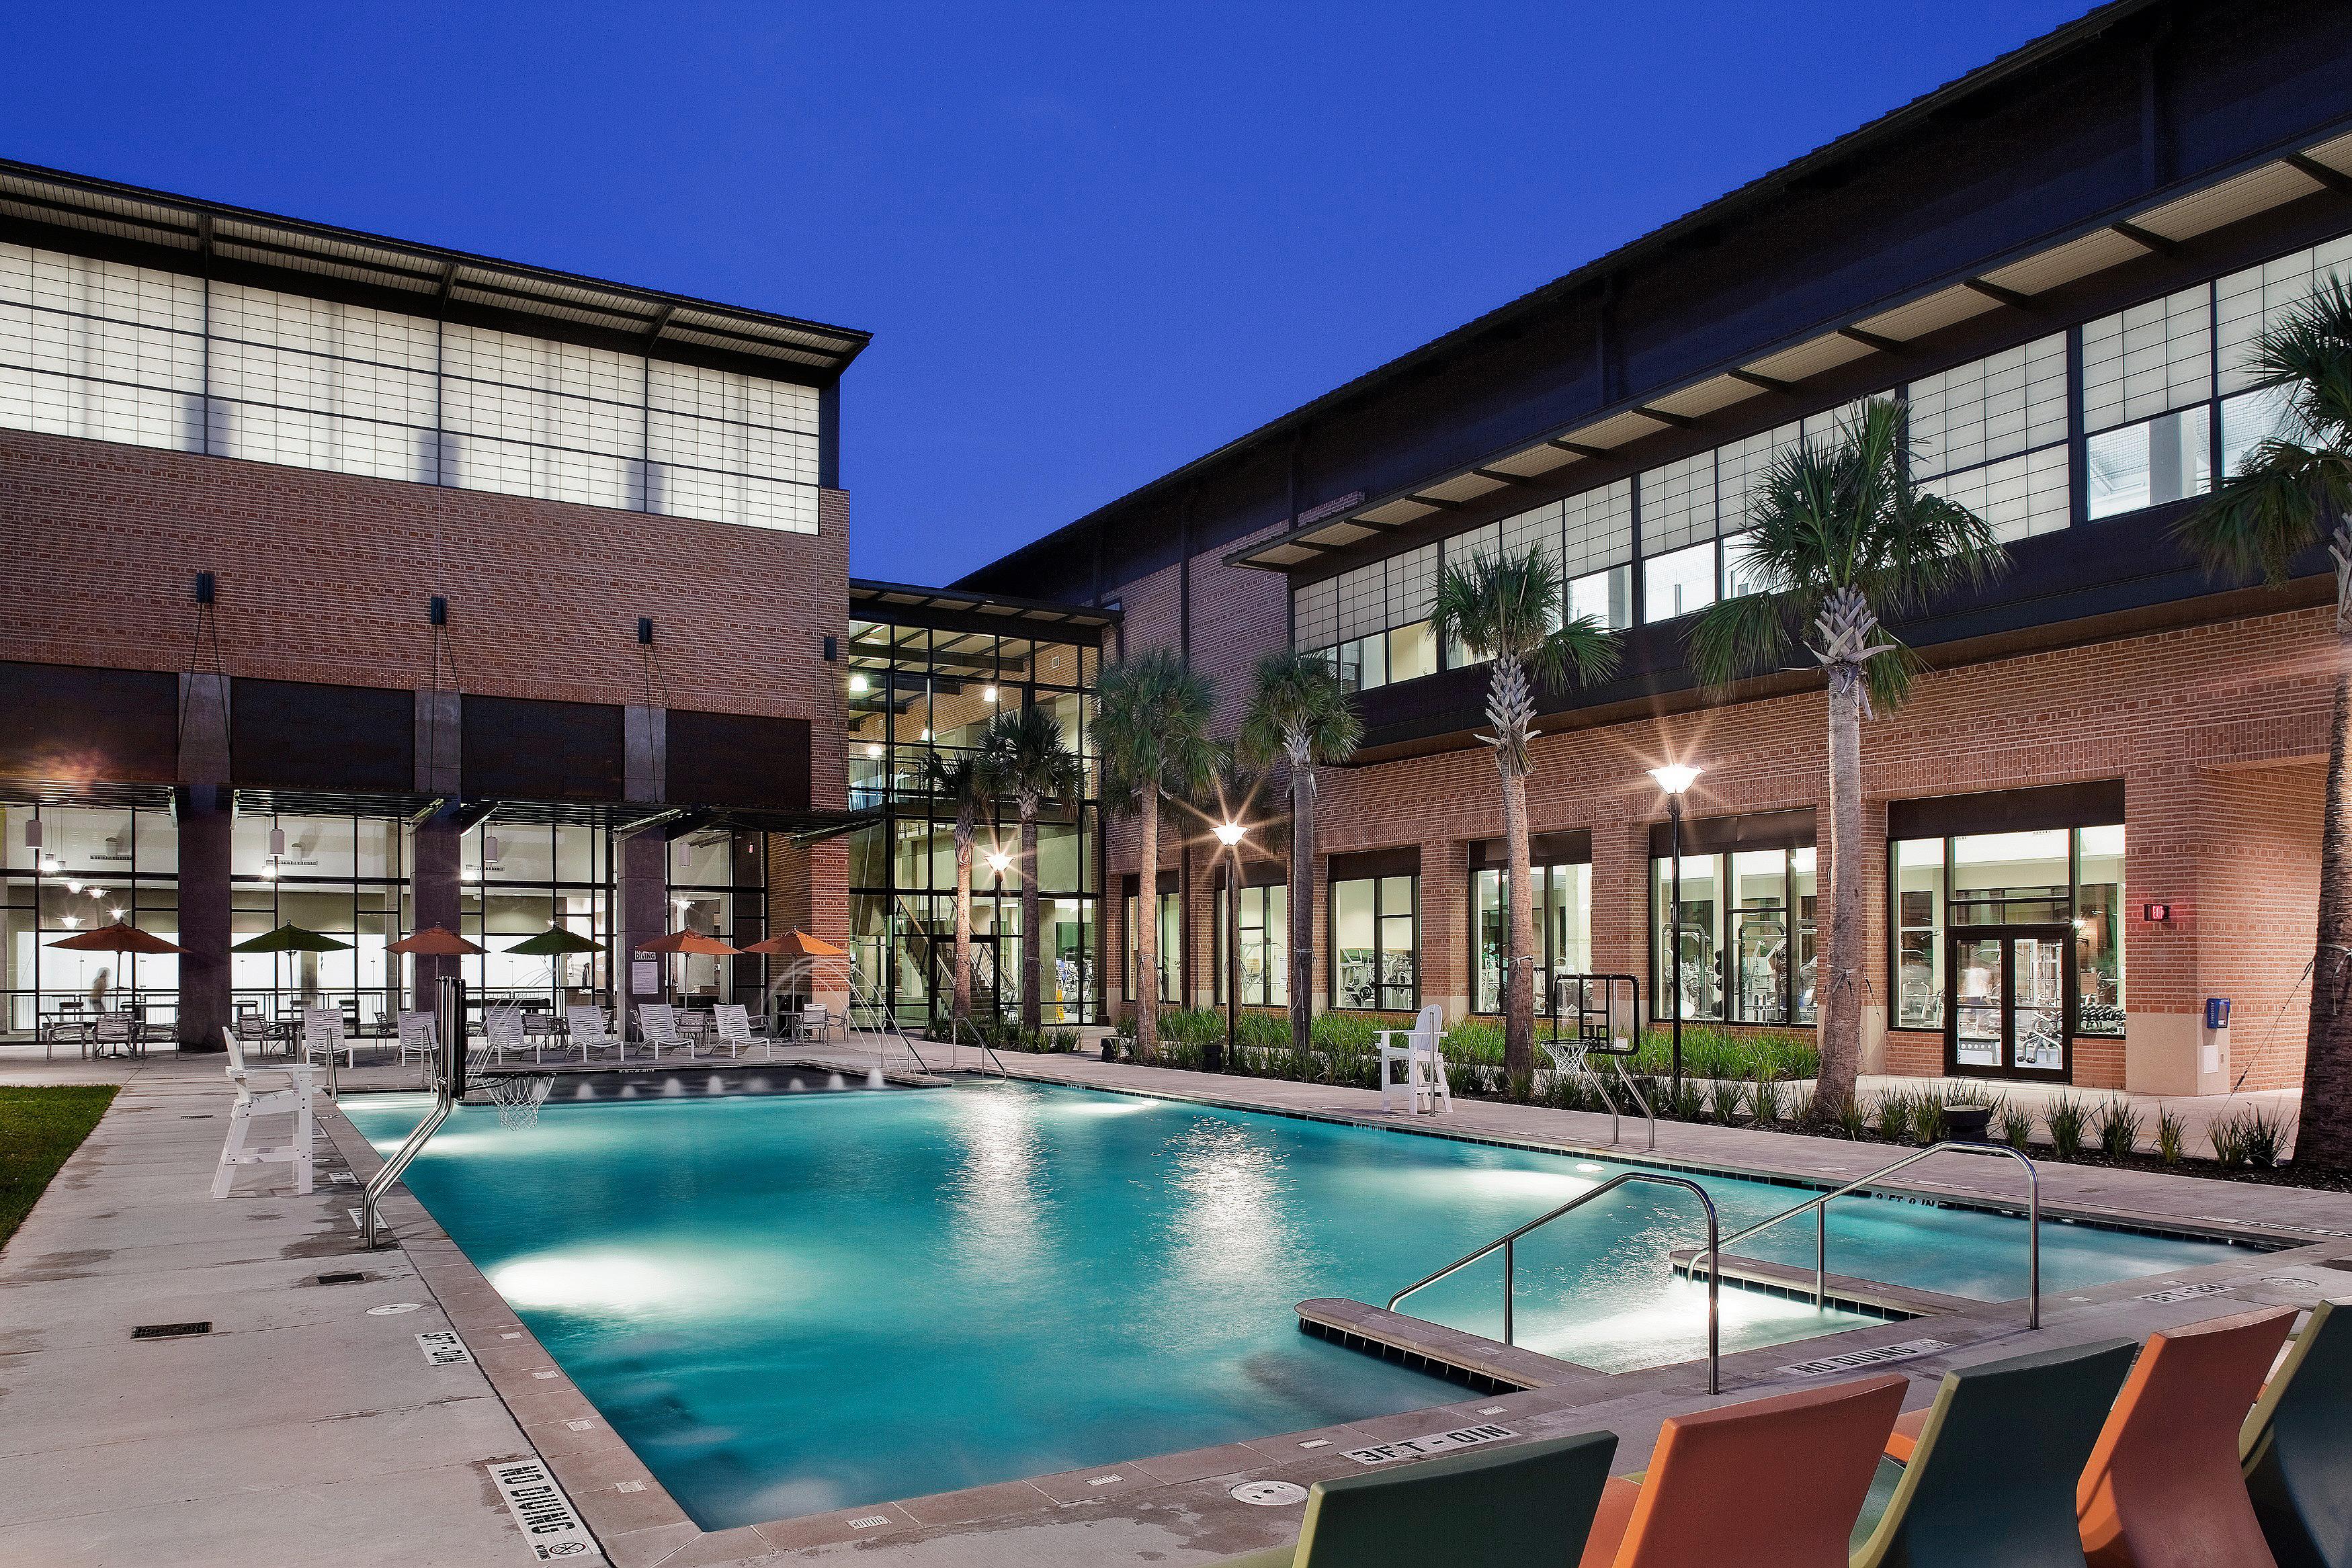 Rice University Gibbs Recreation Center  Lake Flato